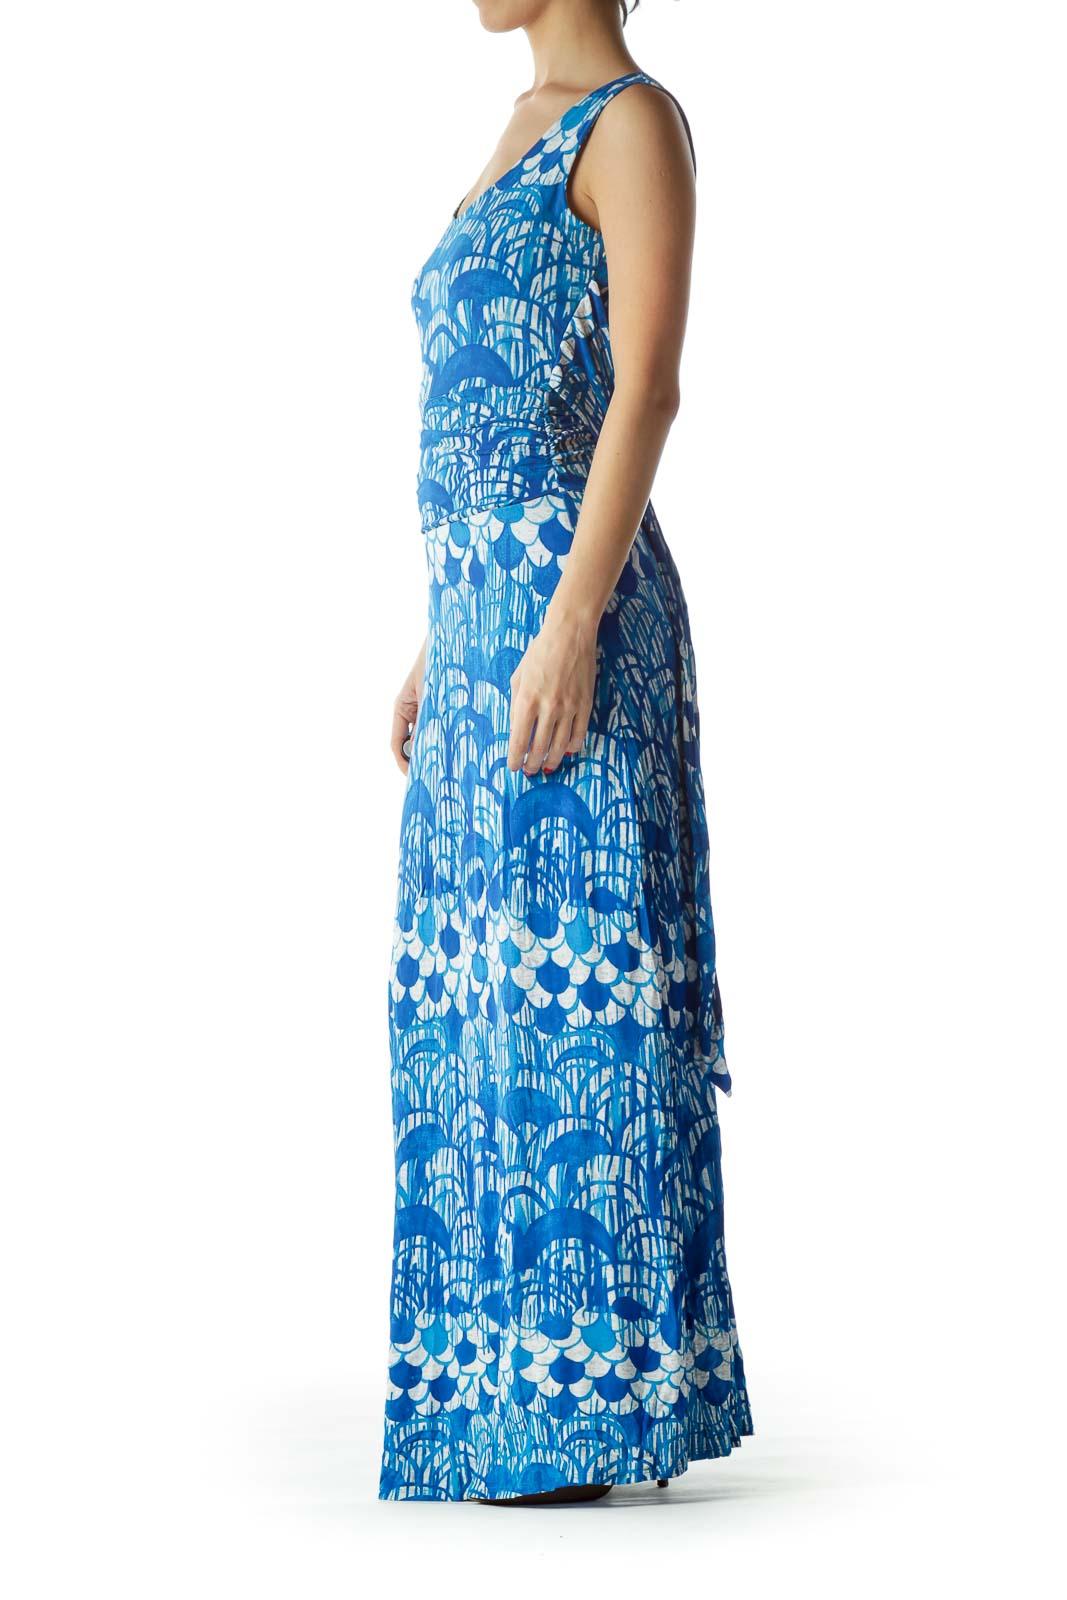 a2b265c109 Shop Blue Print Maxi Dress clothing and handbags at SilkRoll. Trade ...